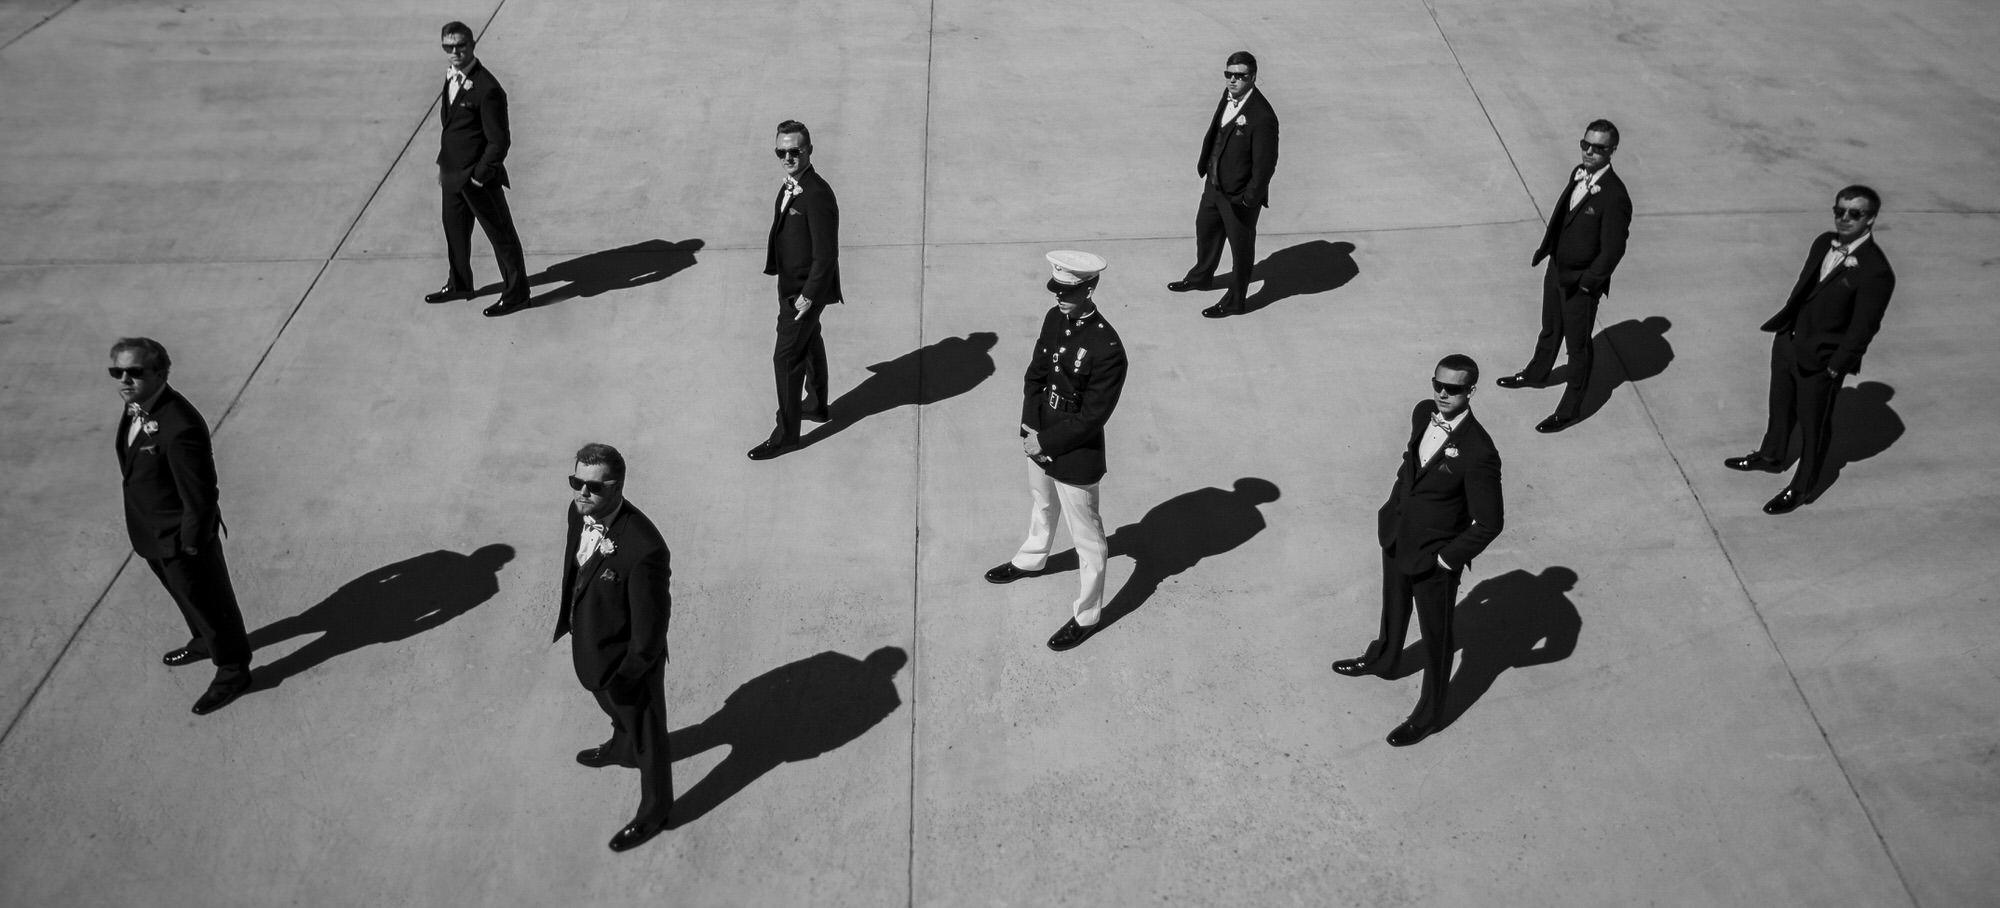 black-and-white-groomal-party-photo-by-ken-pak-washington-dc-photographer